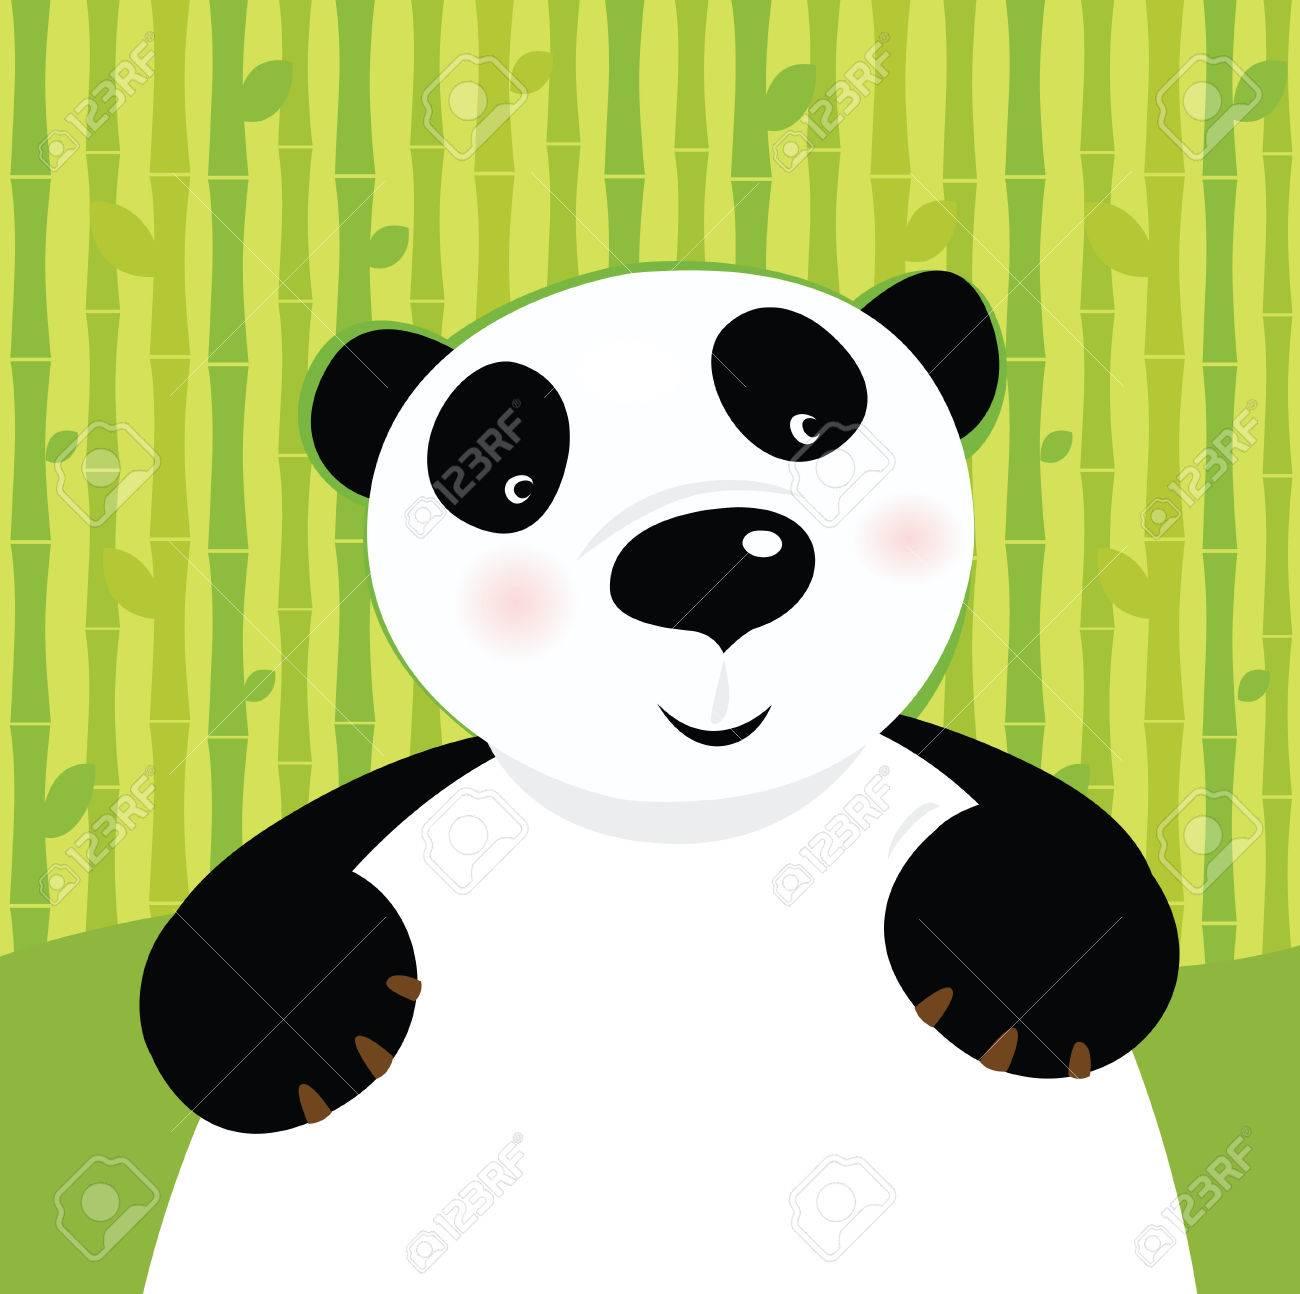 Black and white panda bear on bamboo leaf green background. Stylized  illustration of cute panda bear. Stock Vector - 7069731